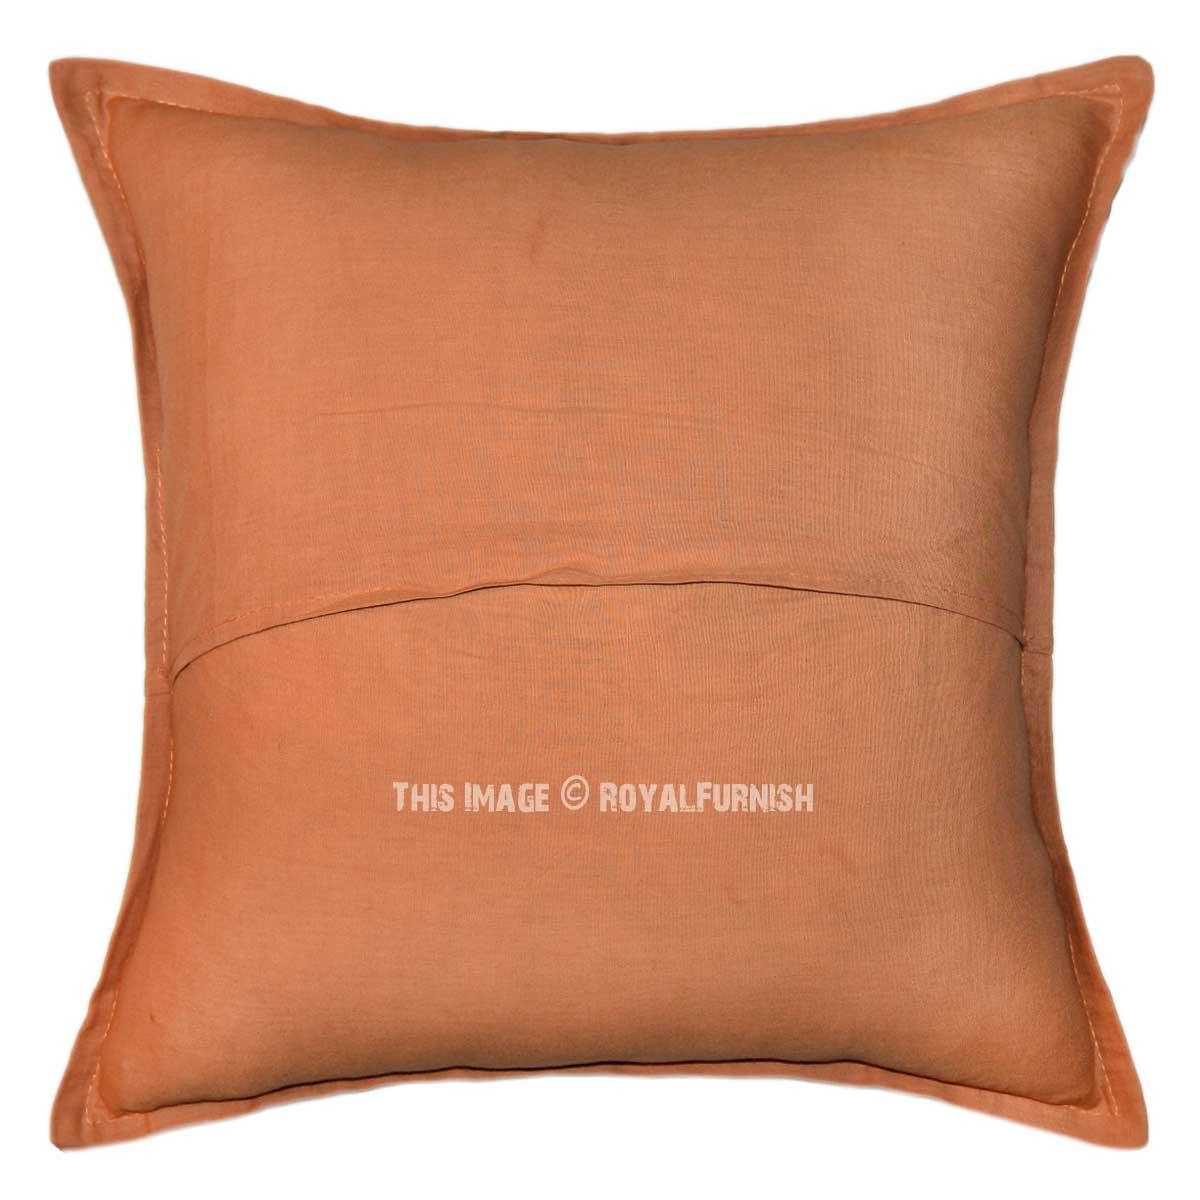 Brown Decorative Applique Designer Throw Pillow Case 16X16 - RoyalFurnish.com